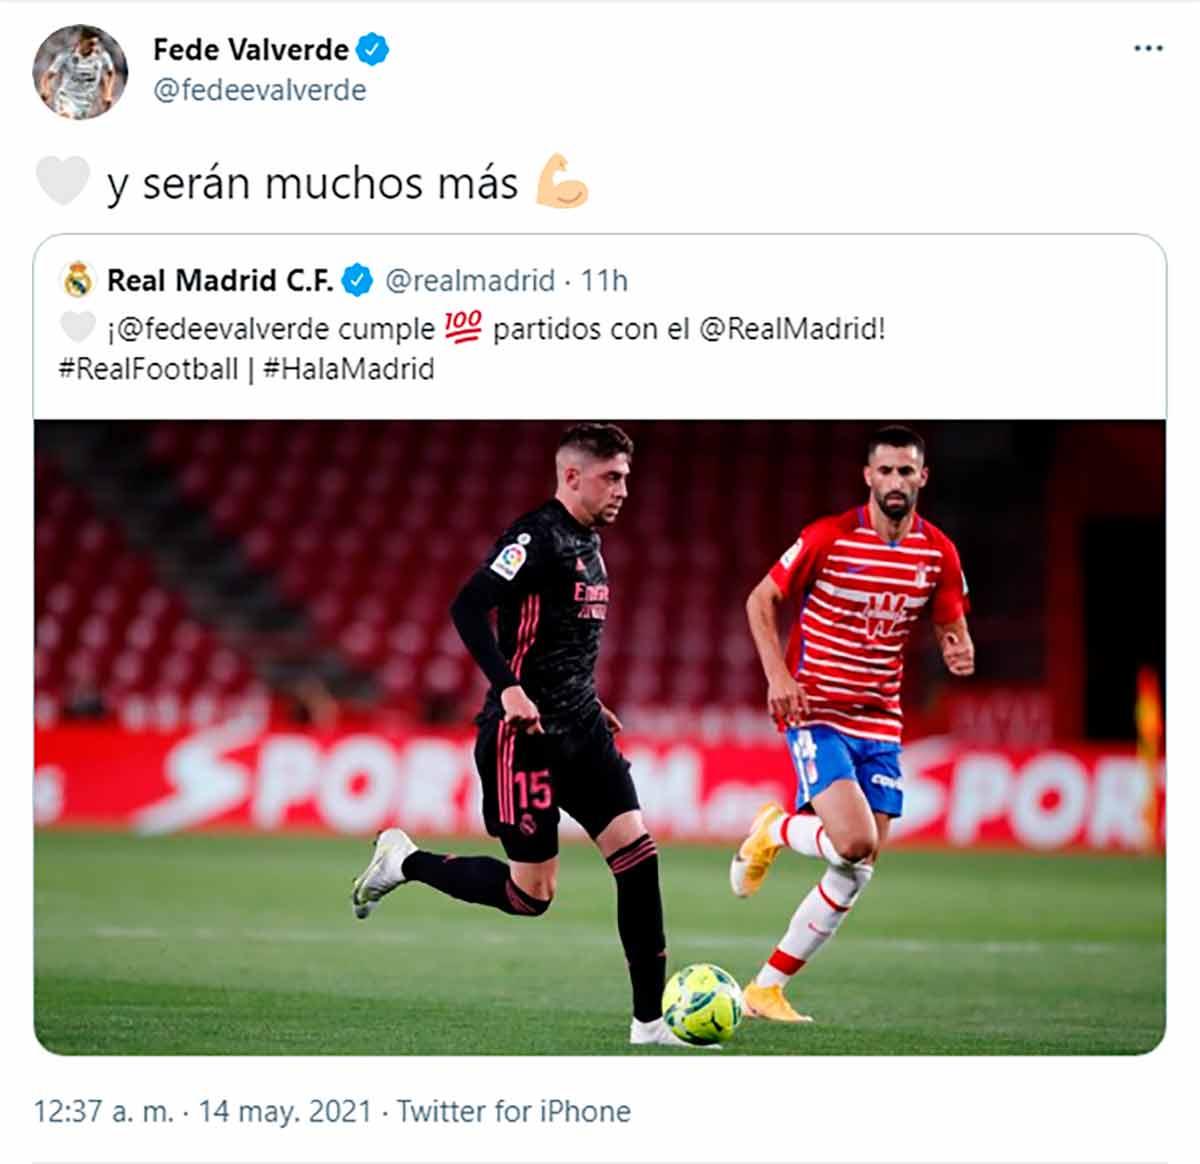 Tuit Fede Valverde 100 partidos